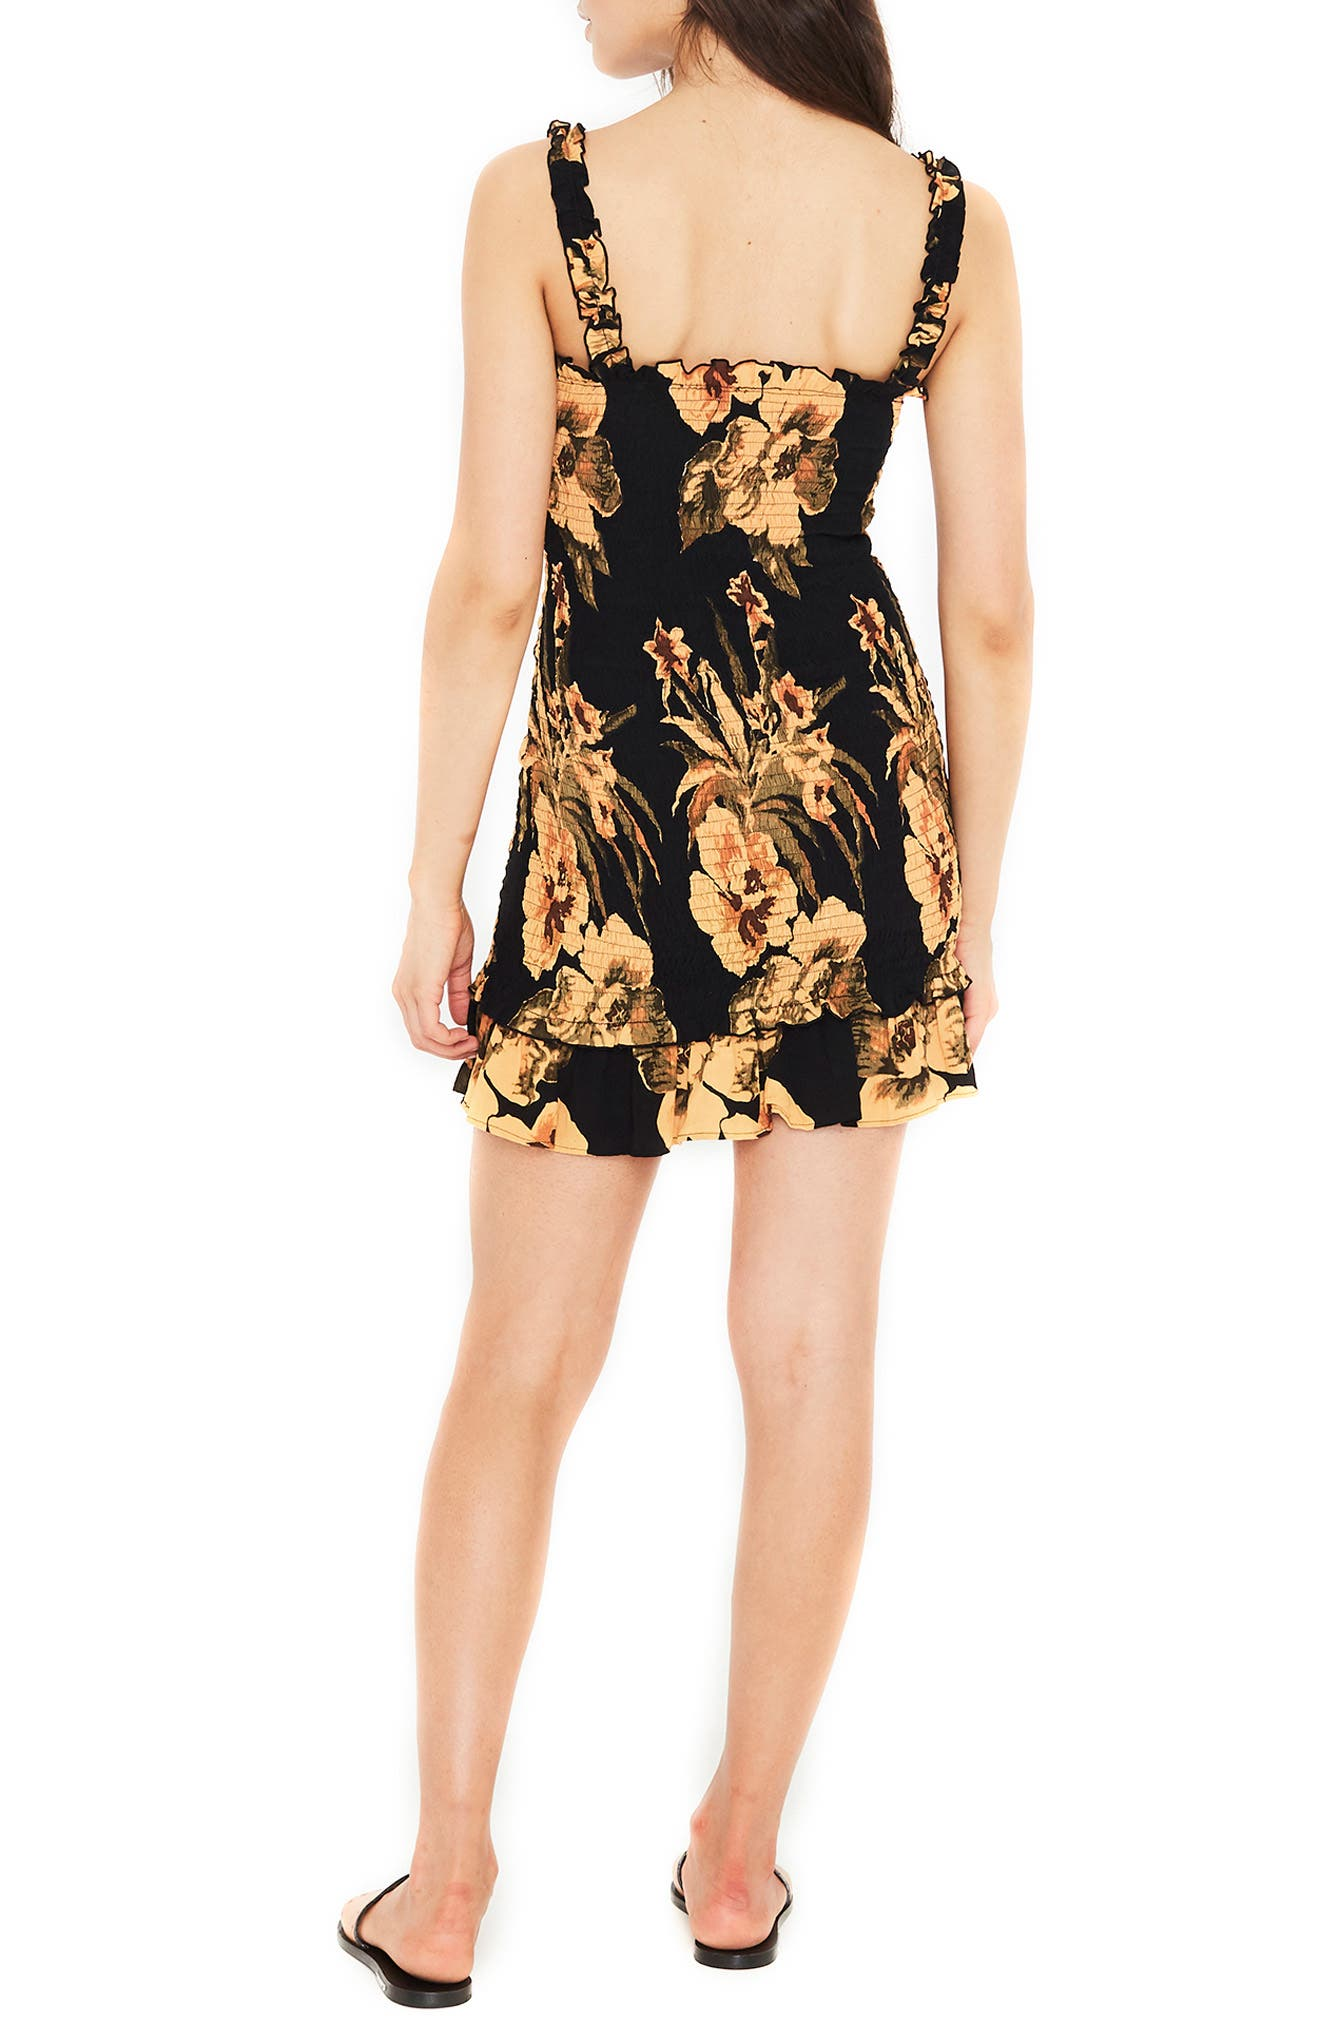 Del Mar Smocked Dress,                             Alternate thumbnail 2, color,                             CARIBBEAN PRINT